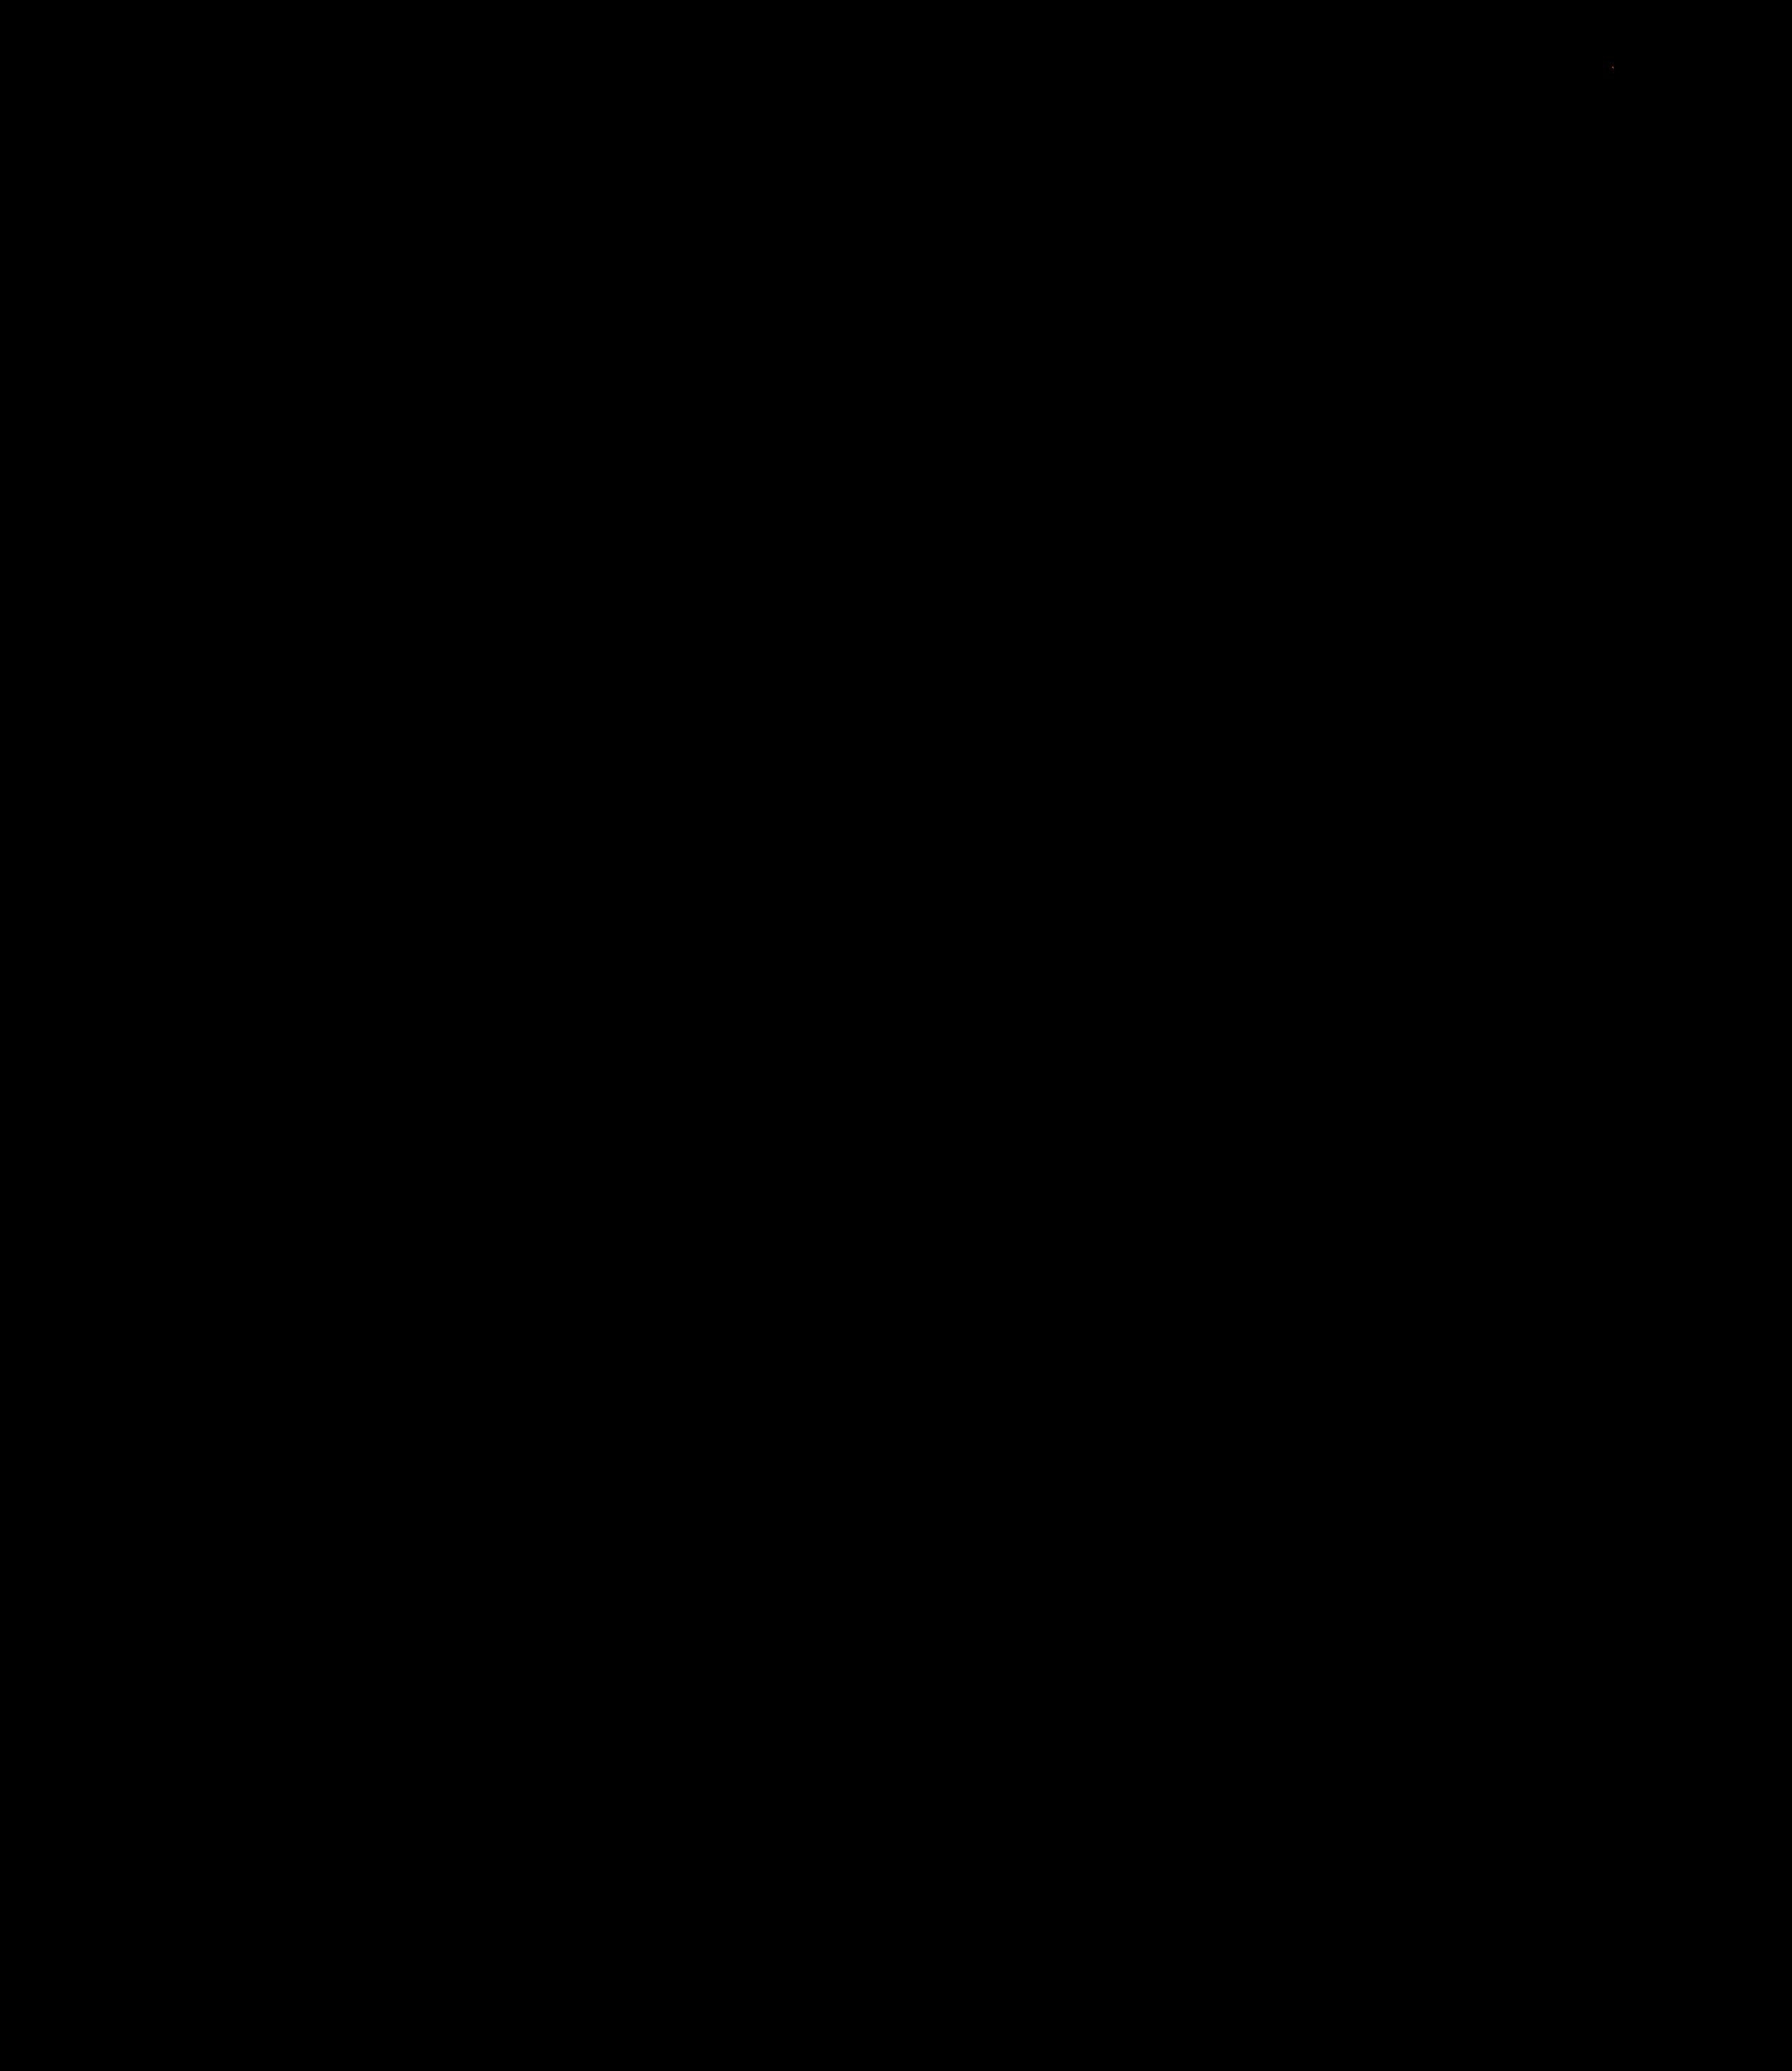 Icon Cantaleon Chöre